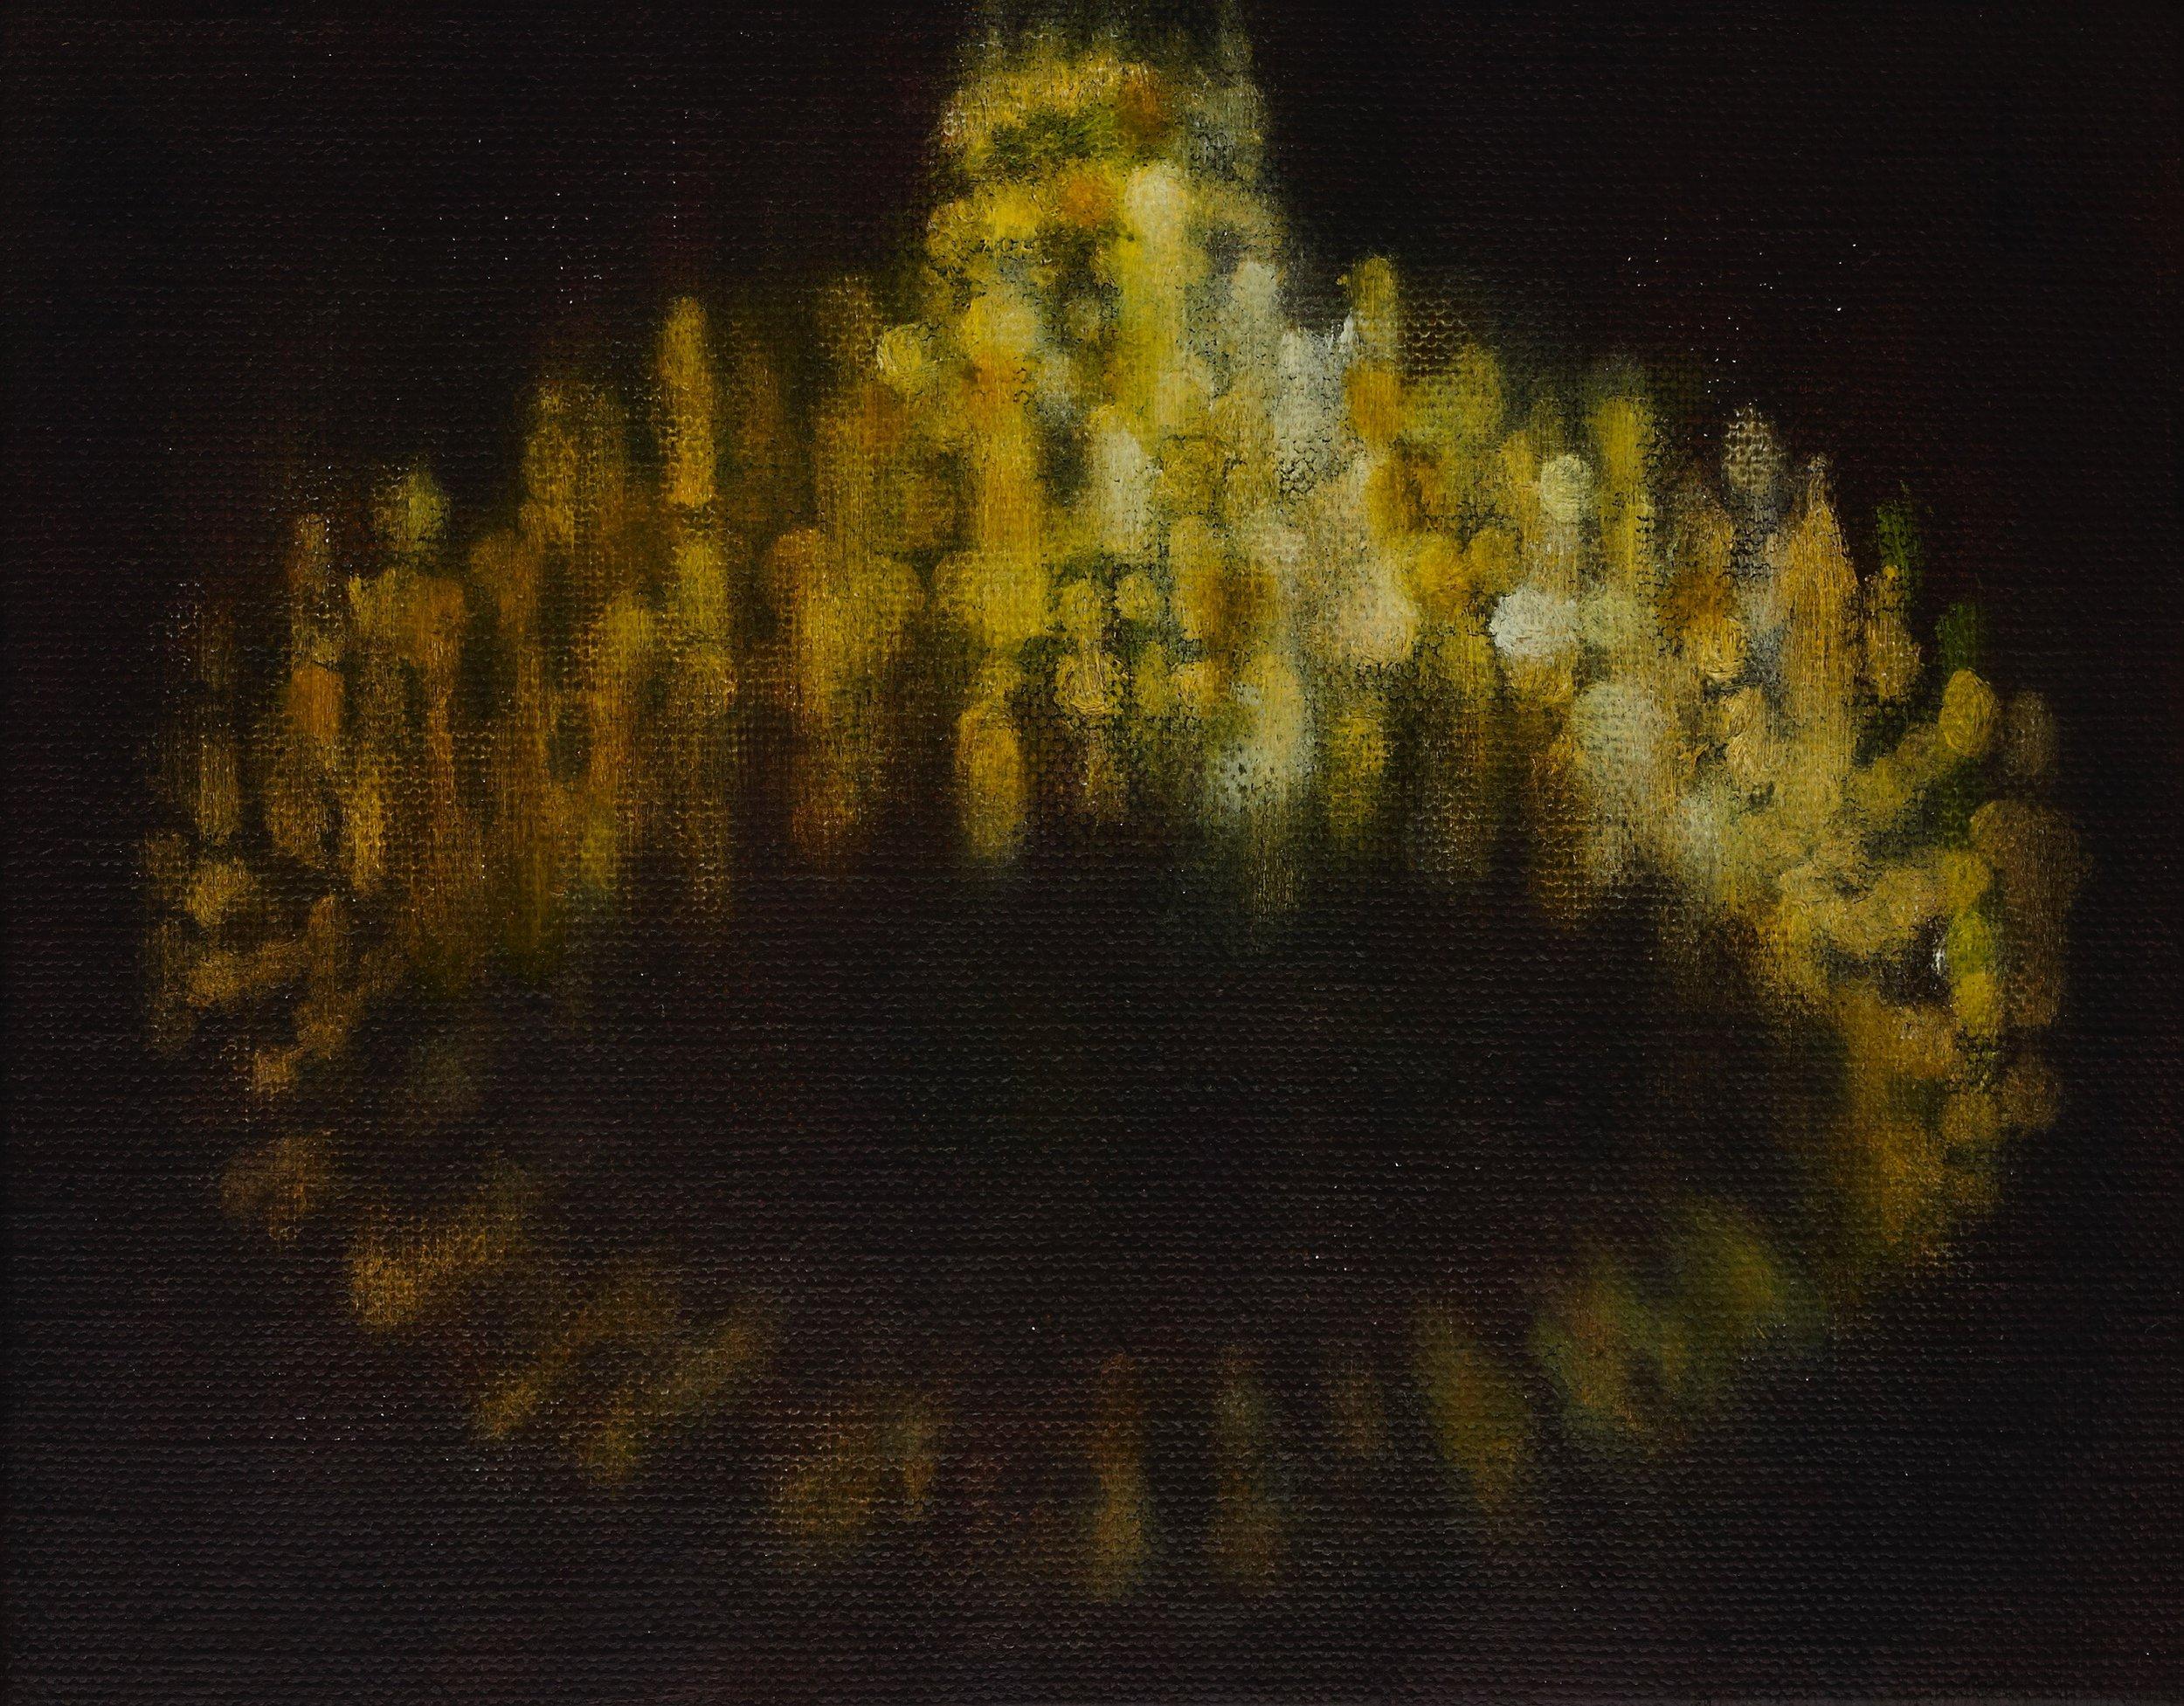 Chandelier, 2010, oil on canvas, 14x18cm